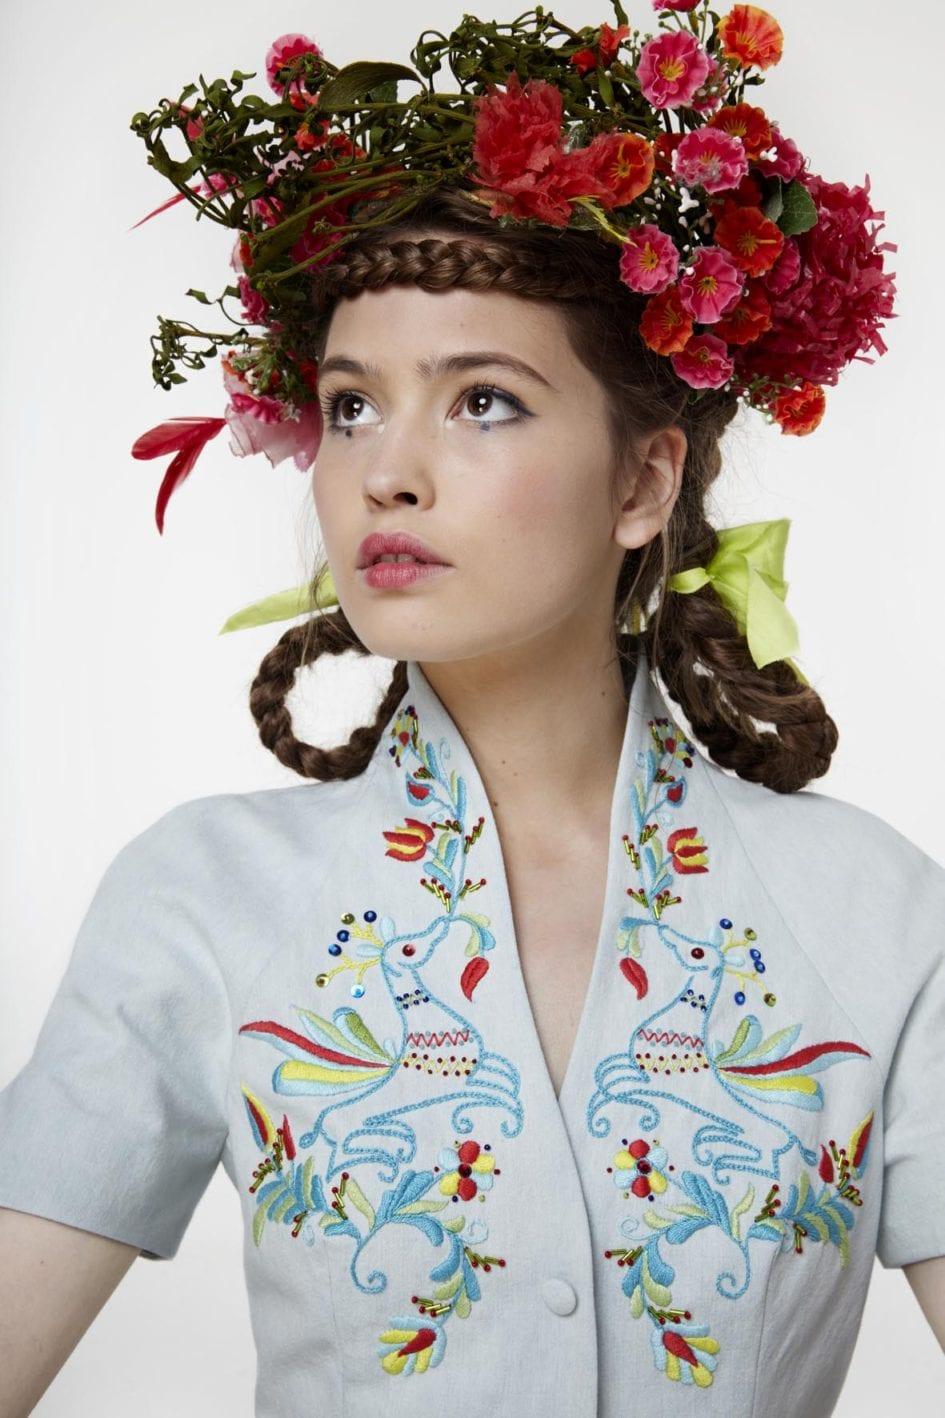 Piroshka Hegedűs Anna